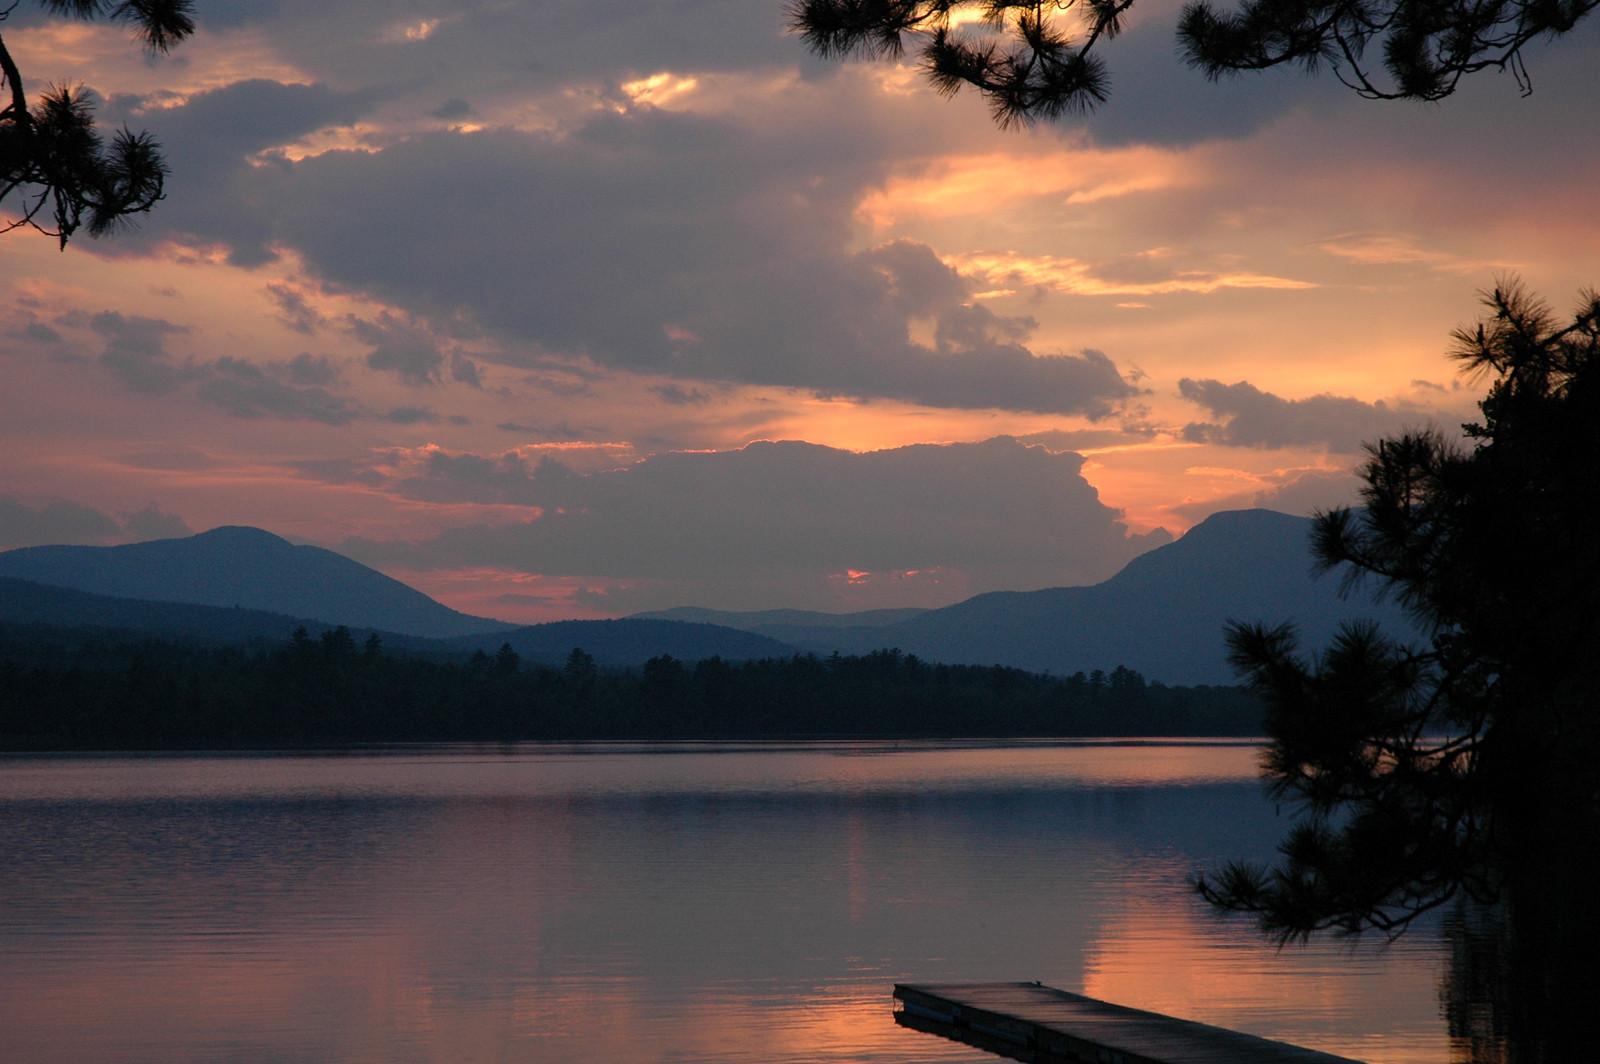 Mr Lake Frontwebb Lake Weld Maine Offers Unsurpassed